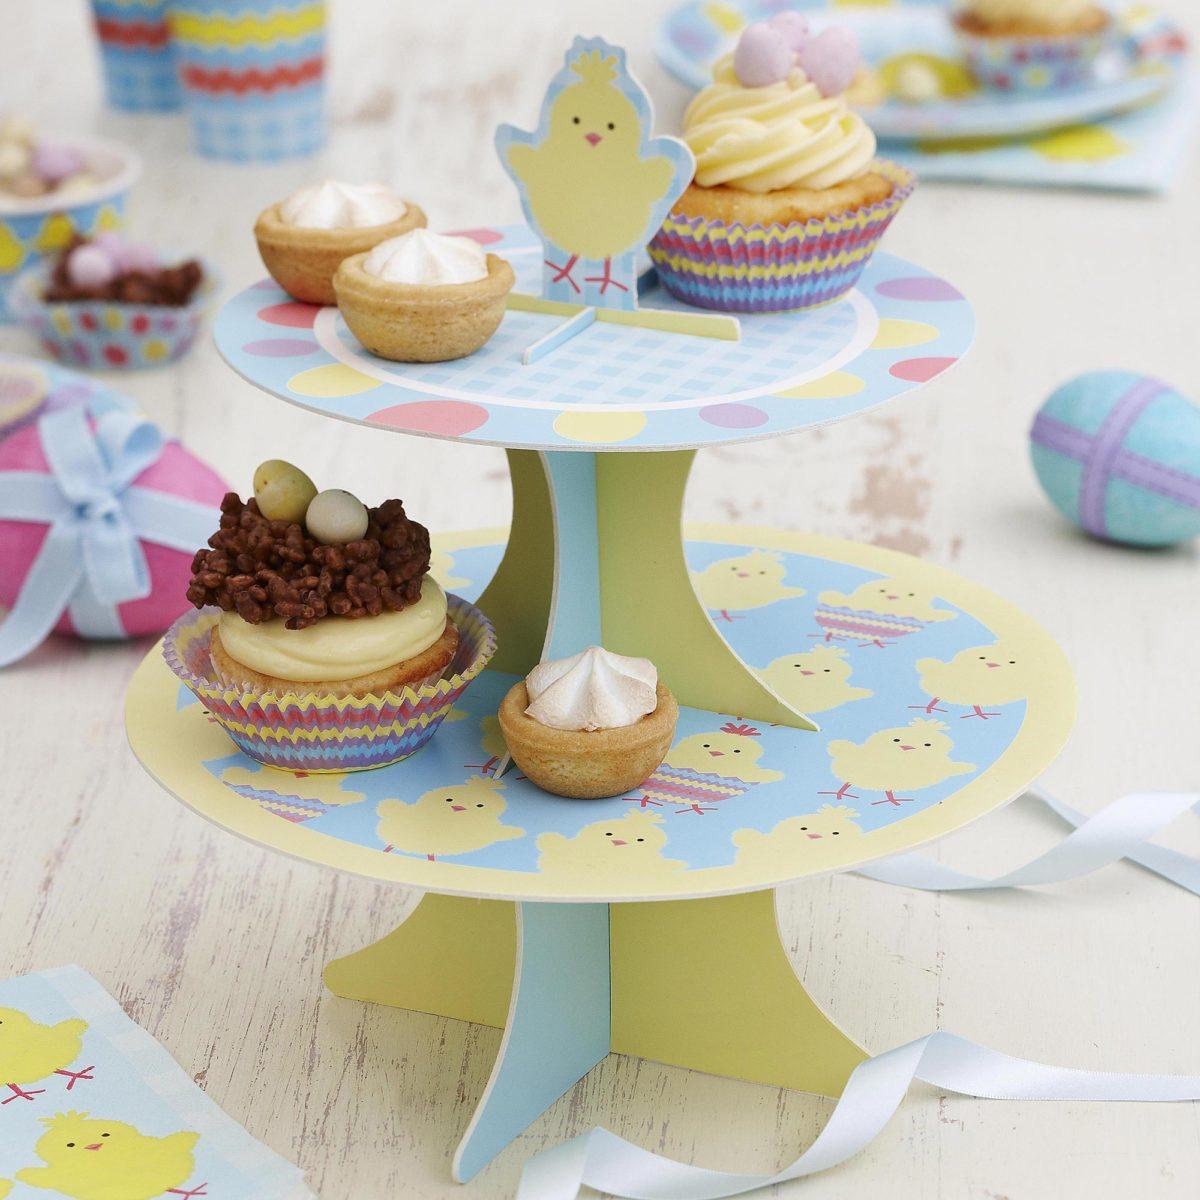 obr.17_neviti_easter-chick-cake-stand-1200x1200.jpg